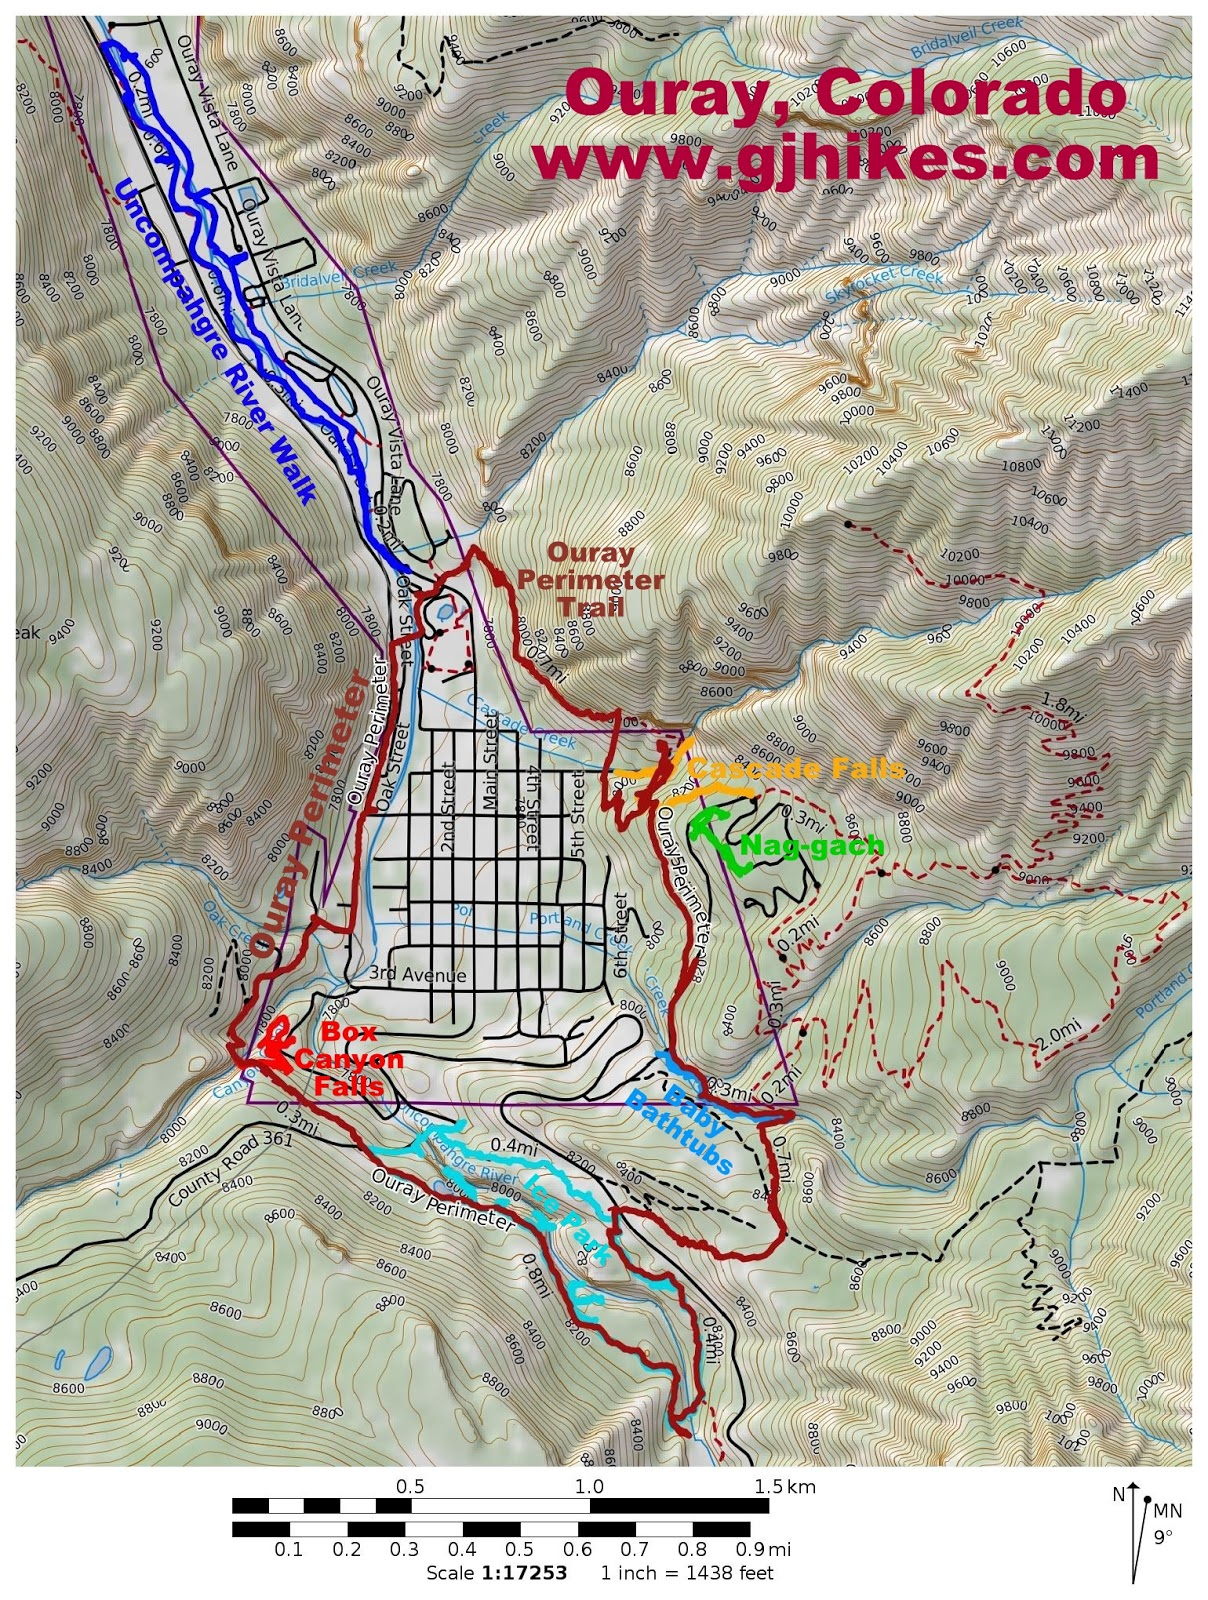 gjhikes.com: Ouray Perimeter Trail